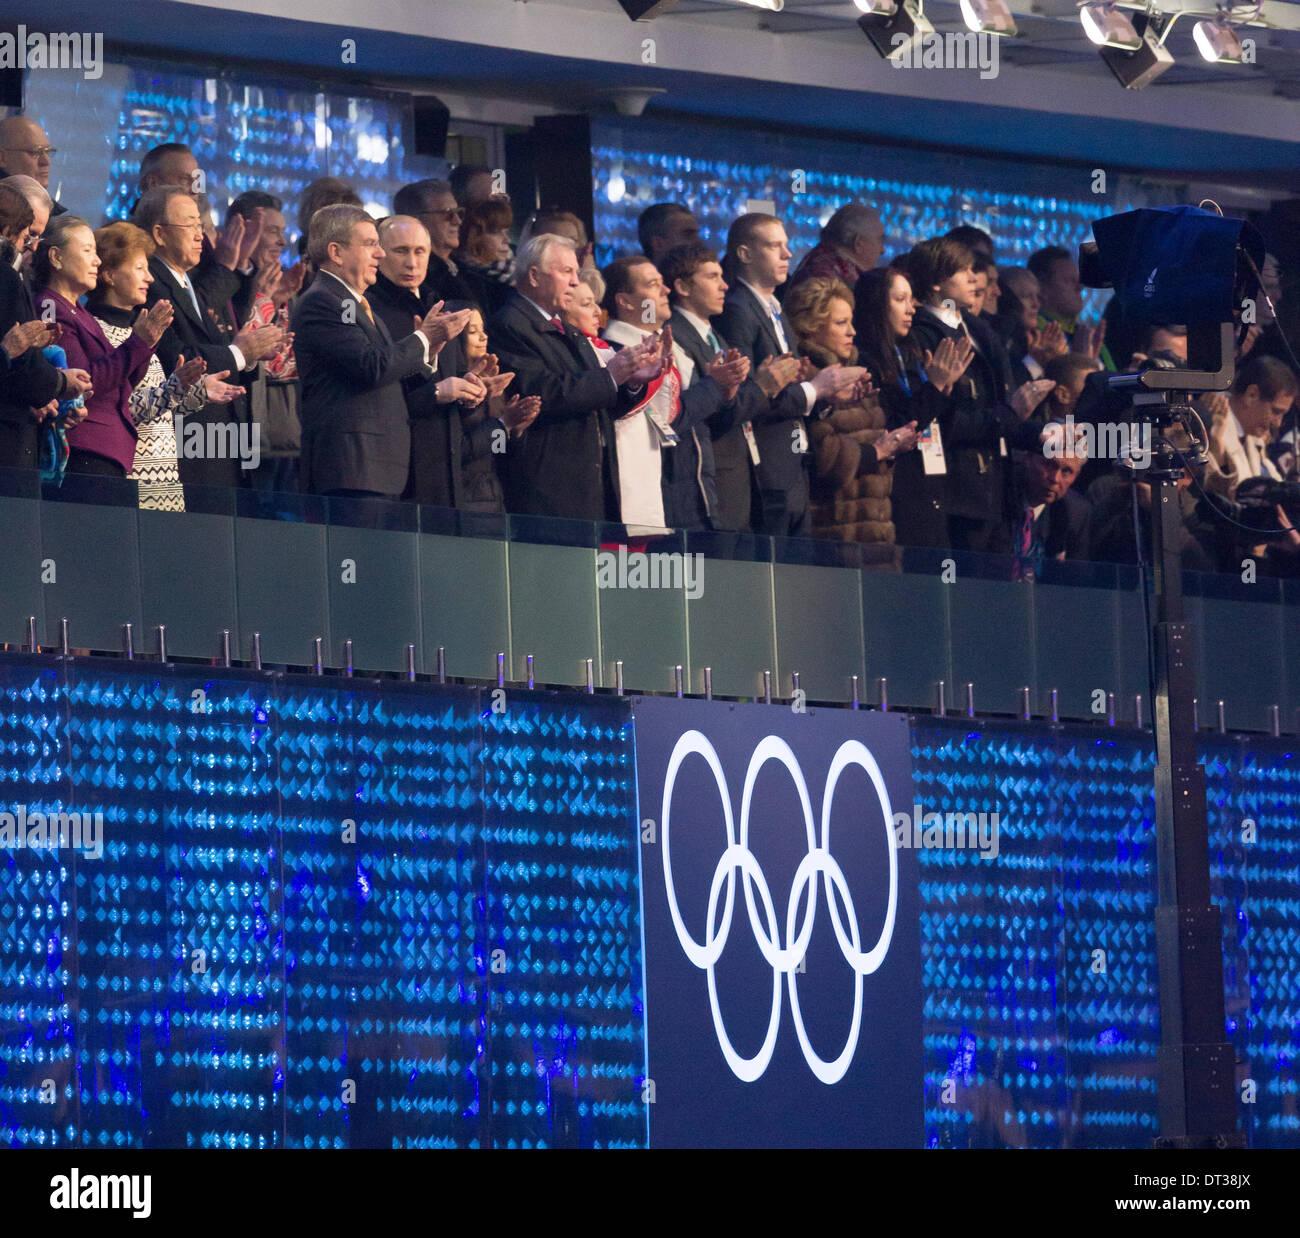 Sochi, Krasnodar Krai, Russia. 07th Feb, 2014. Sochi, Russia. 07th Feb, 2014. Opening Ceremonies for the XXII Olympic Winter Games Sochi 2014. FISHT Stadium, Adler/Sochi, Russia. President Vladmir Putin and IOC President Jacques Rogge watching the ceremony Credit:  Action Plus Sports Images/Alamy Live News - Stock Image